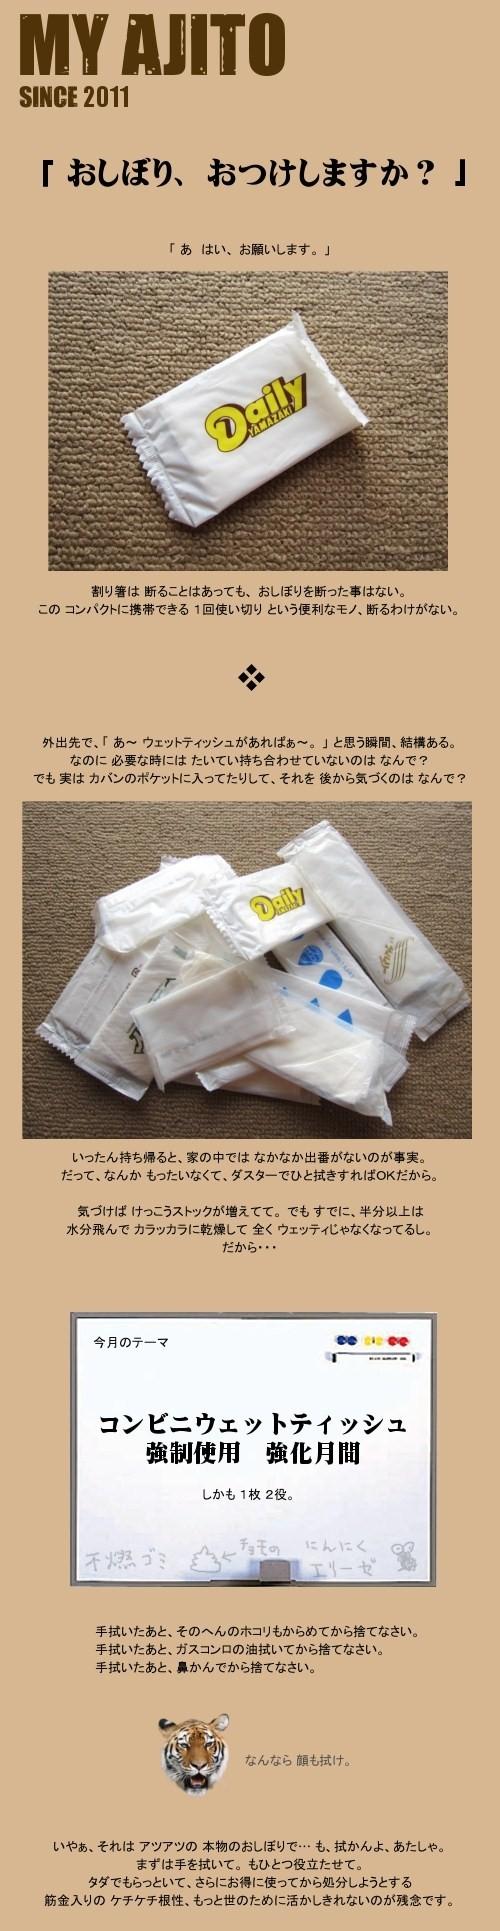 th_01.jpg